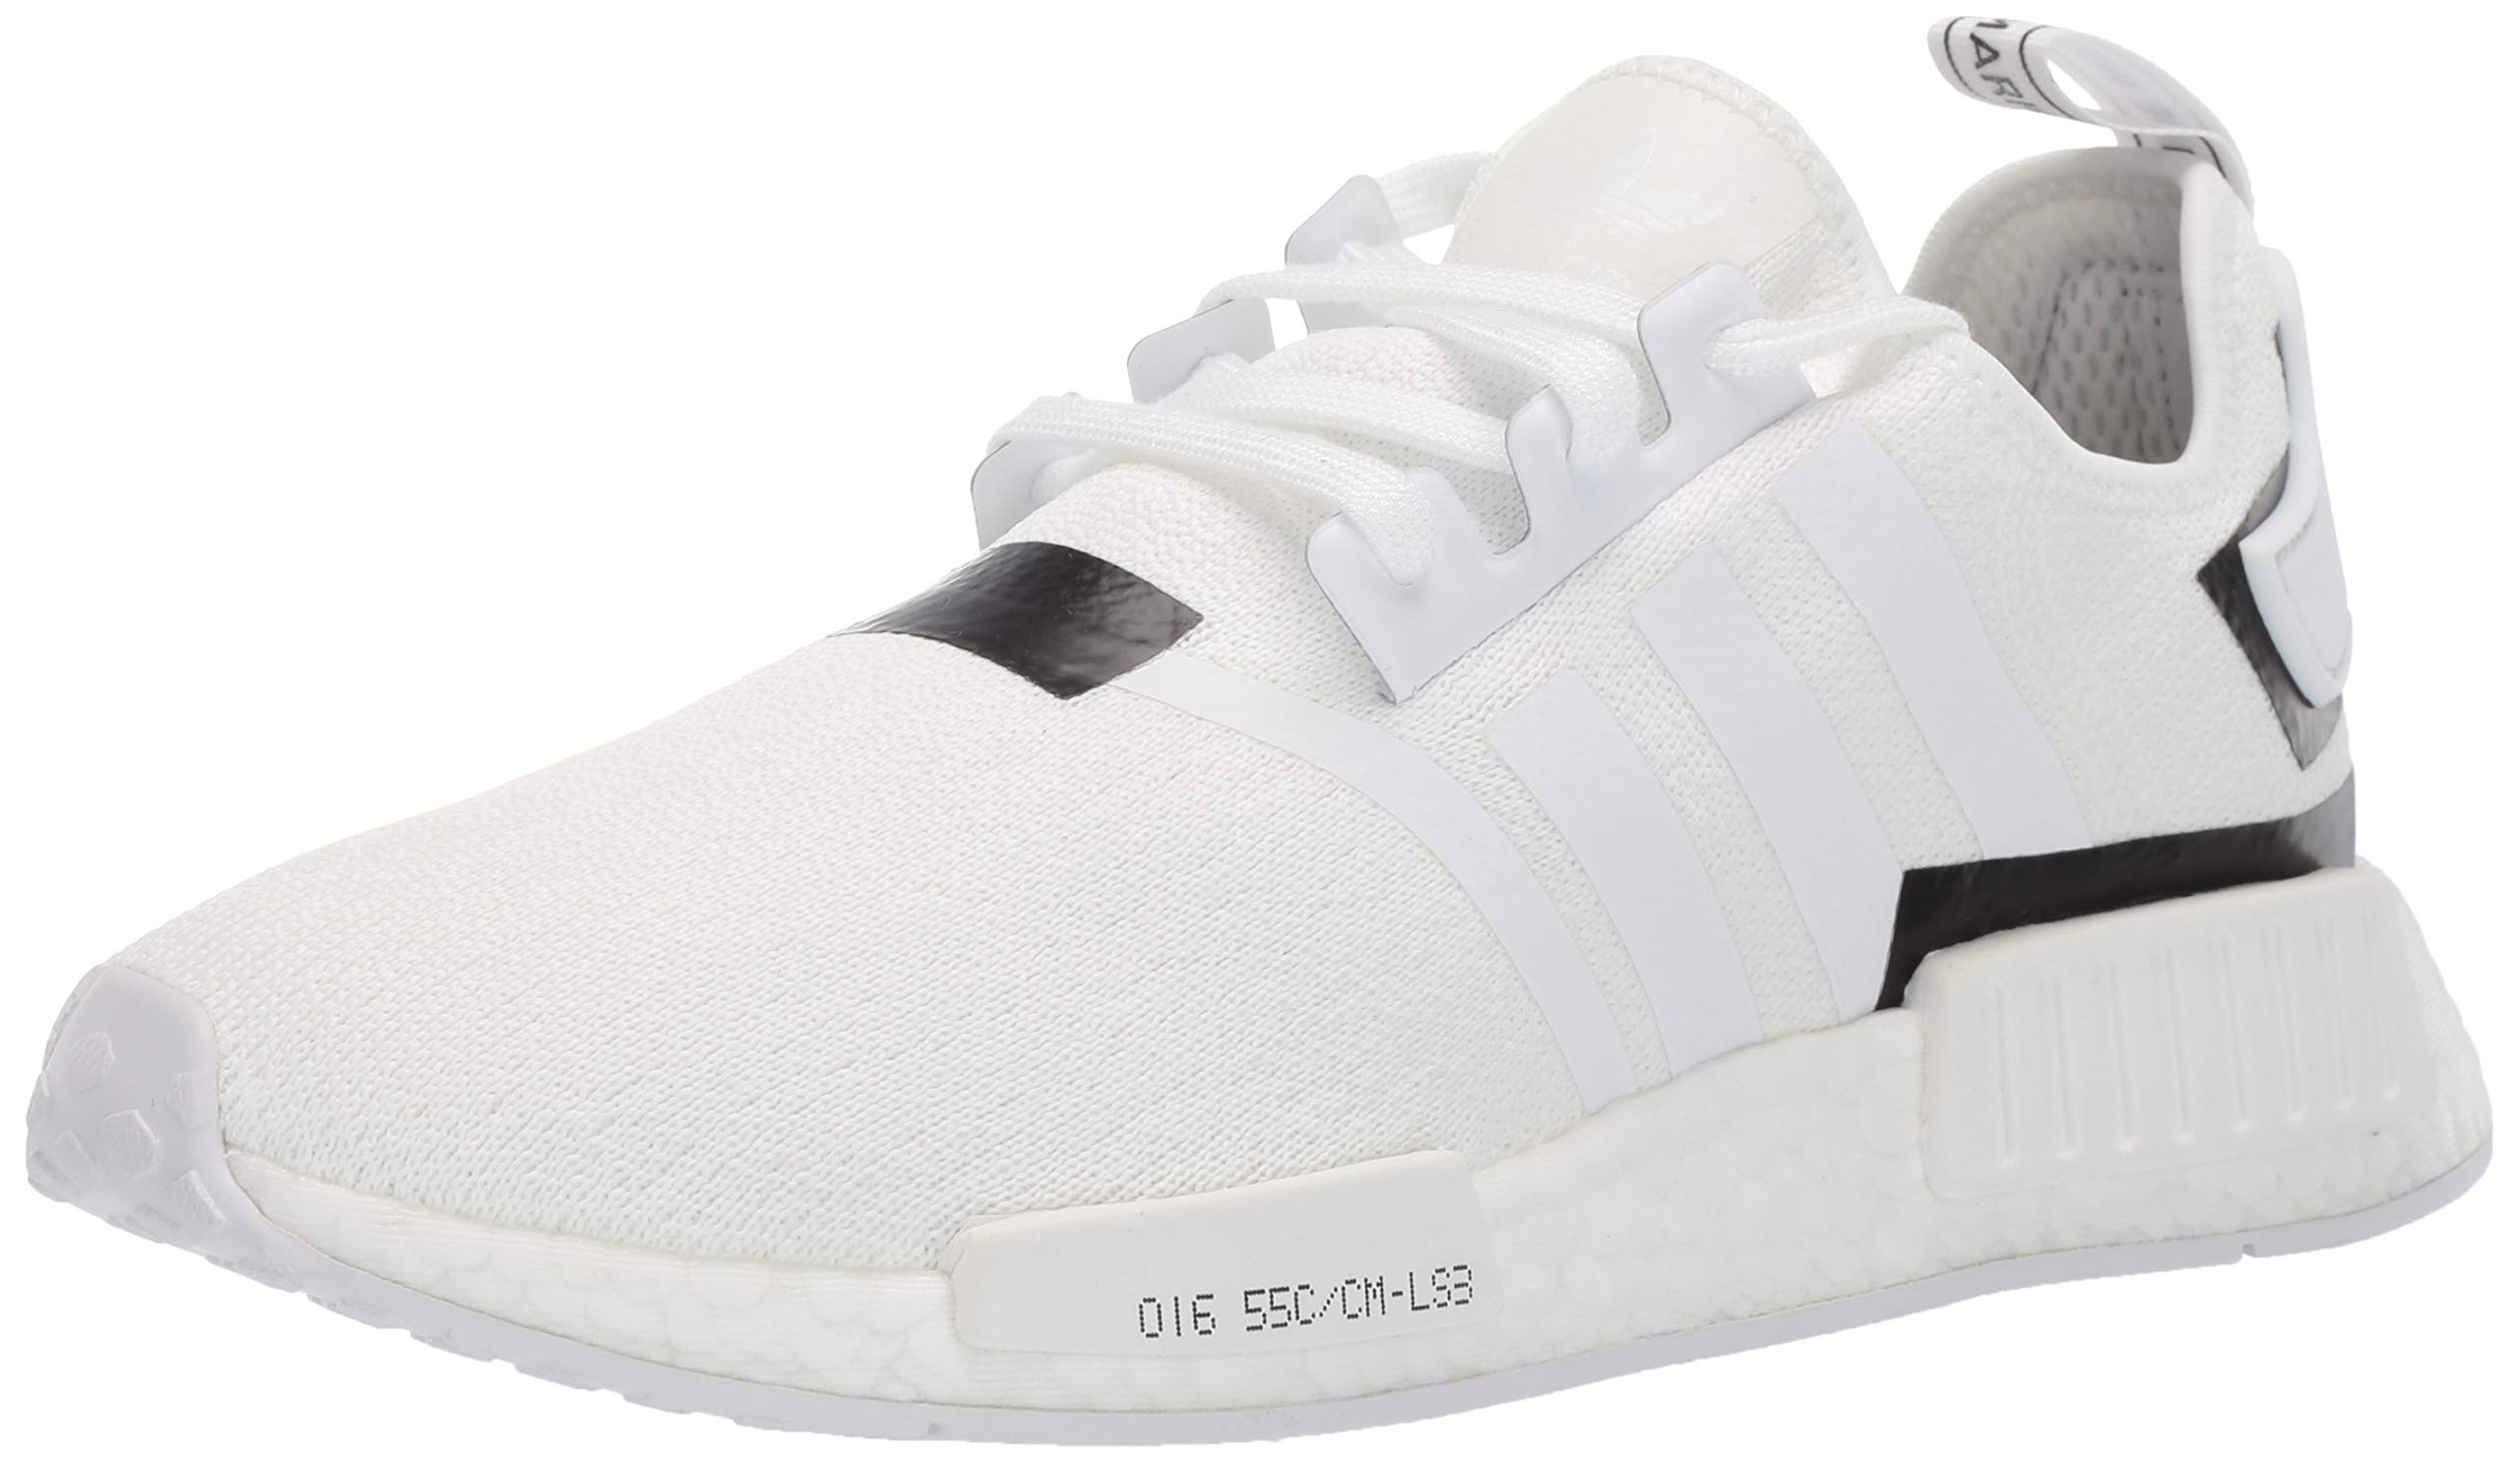 adidas Originals Men's NMD_R1 Running Shoe White/Black, 4 M US